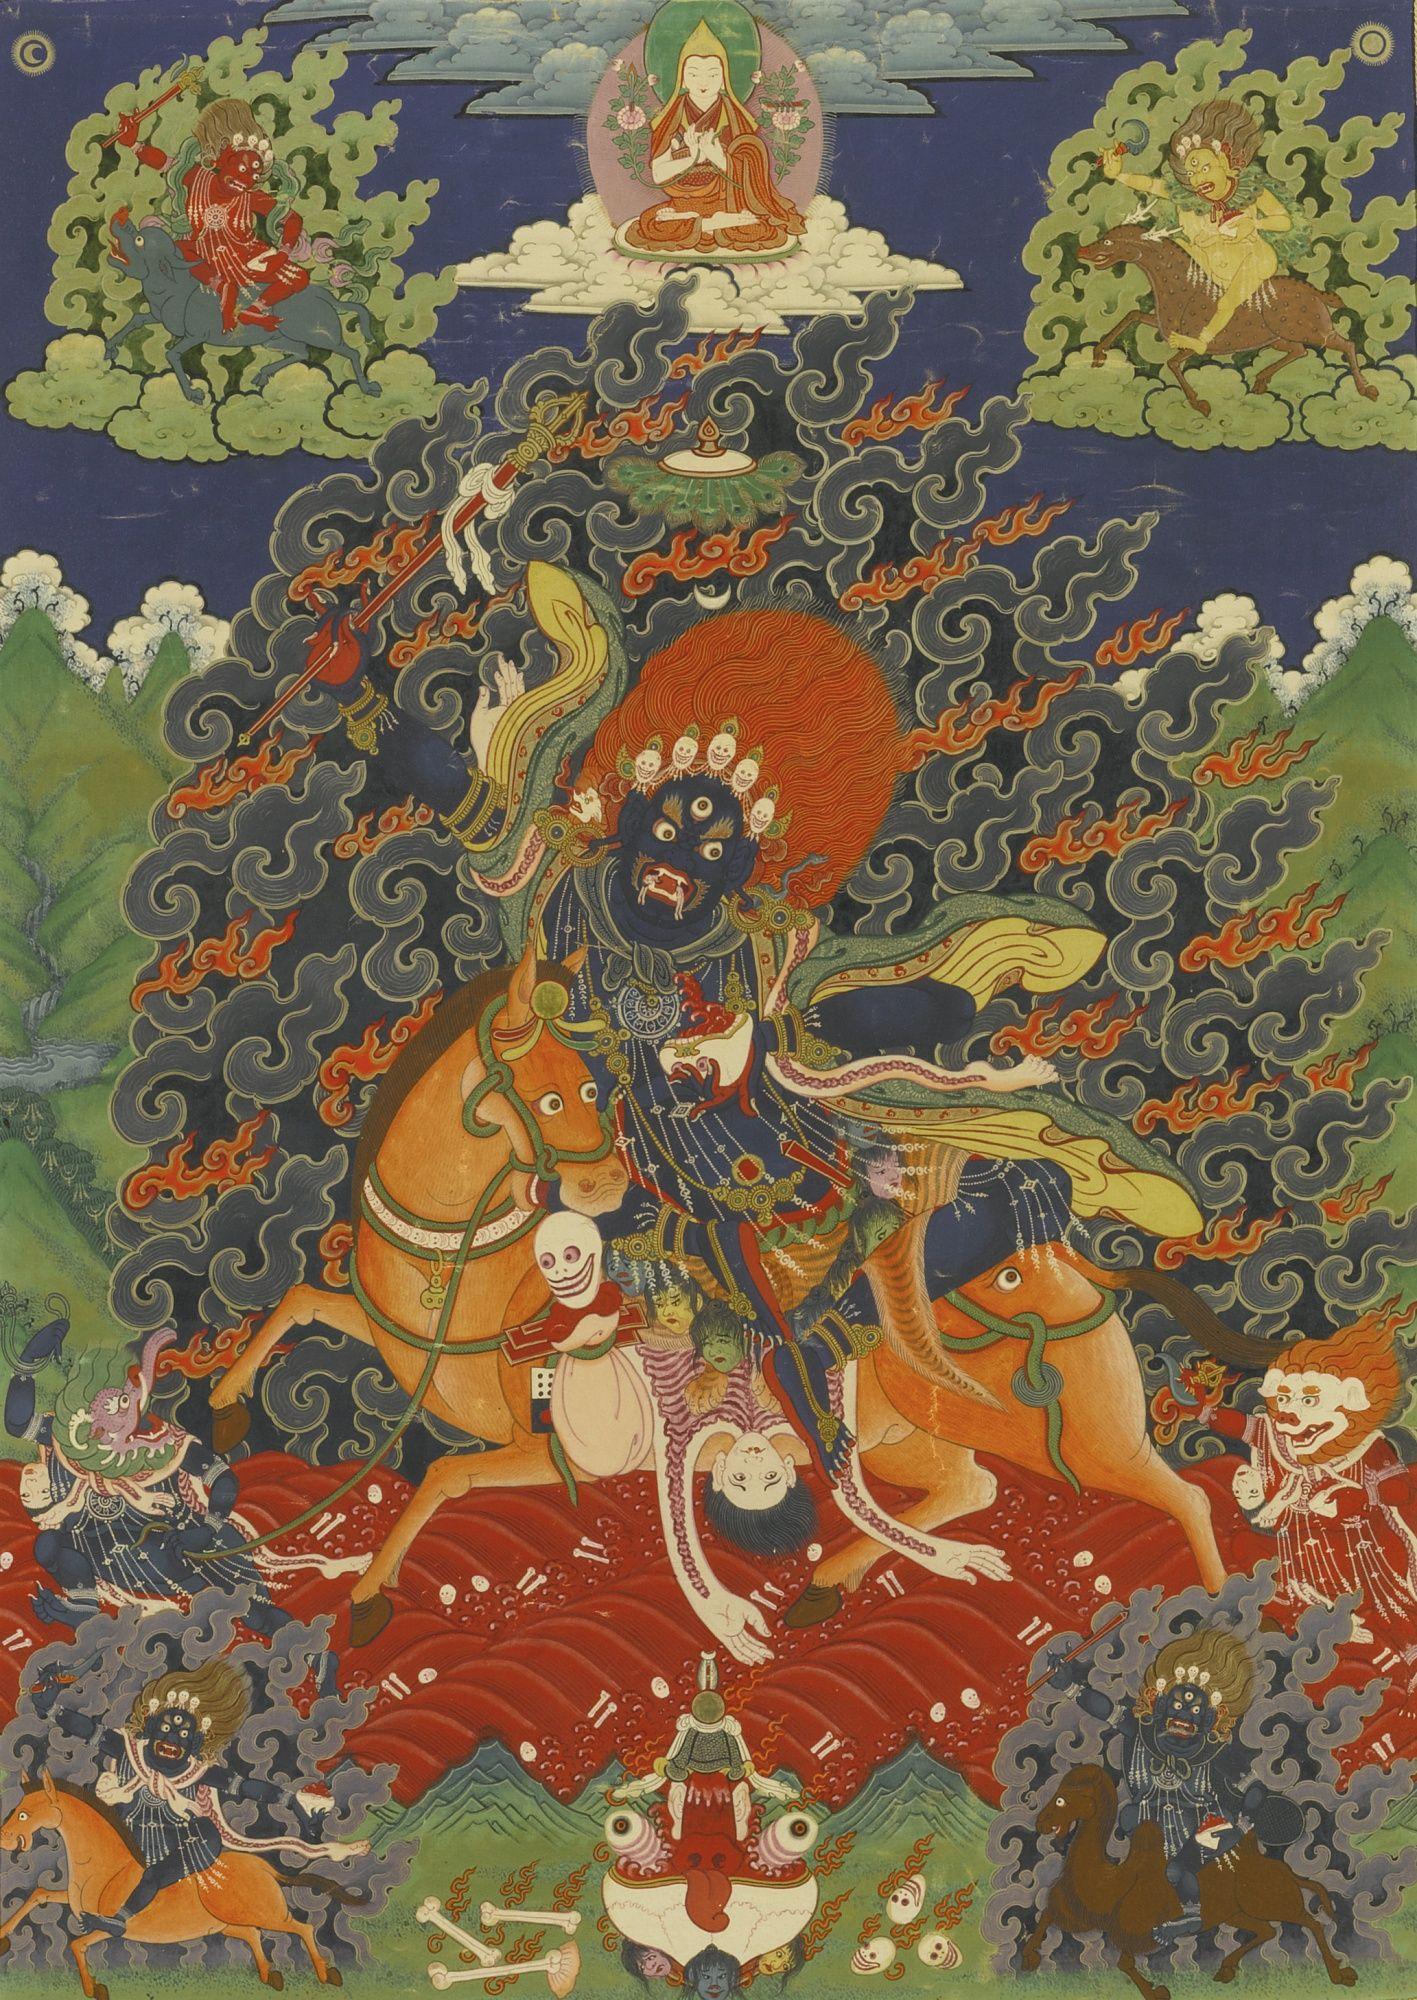 Shri Devi in her current manifestation is a Tibetan form of an ...